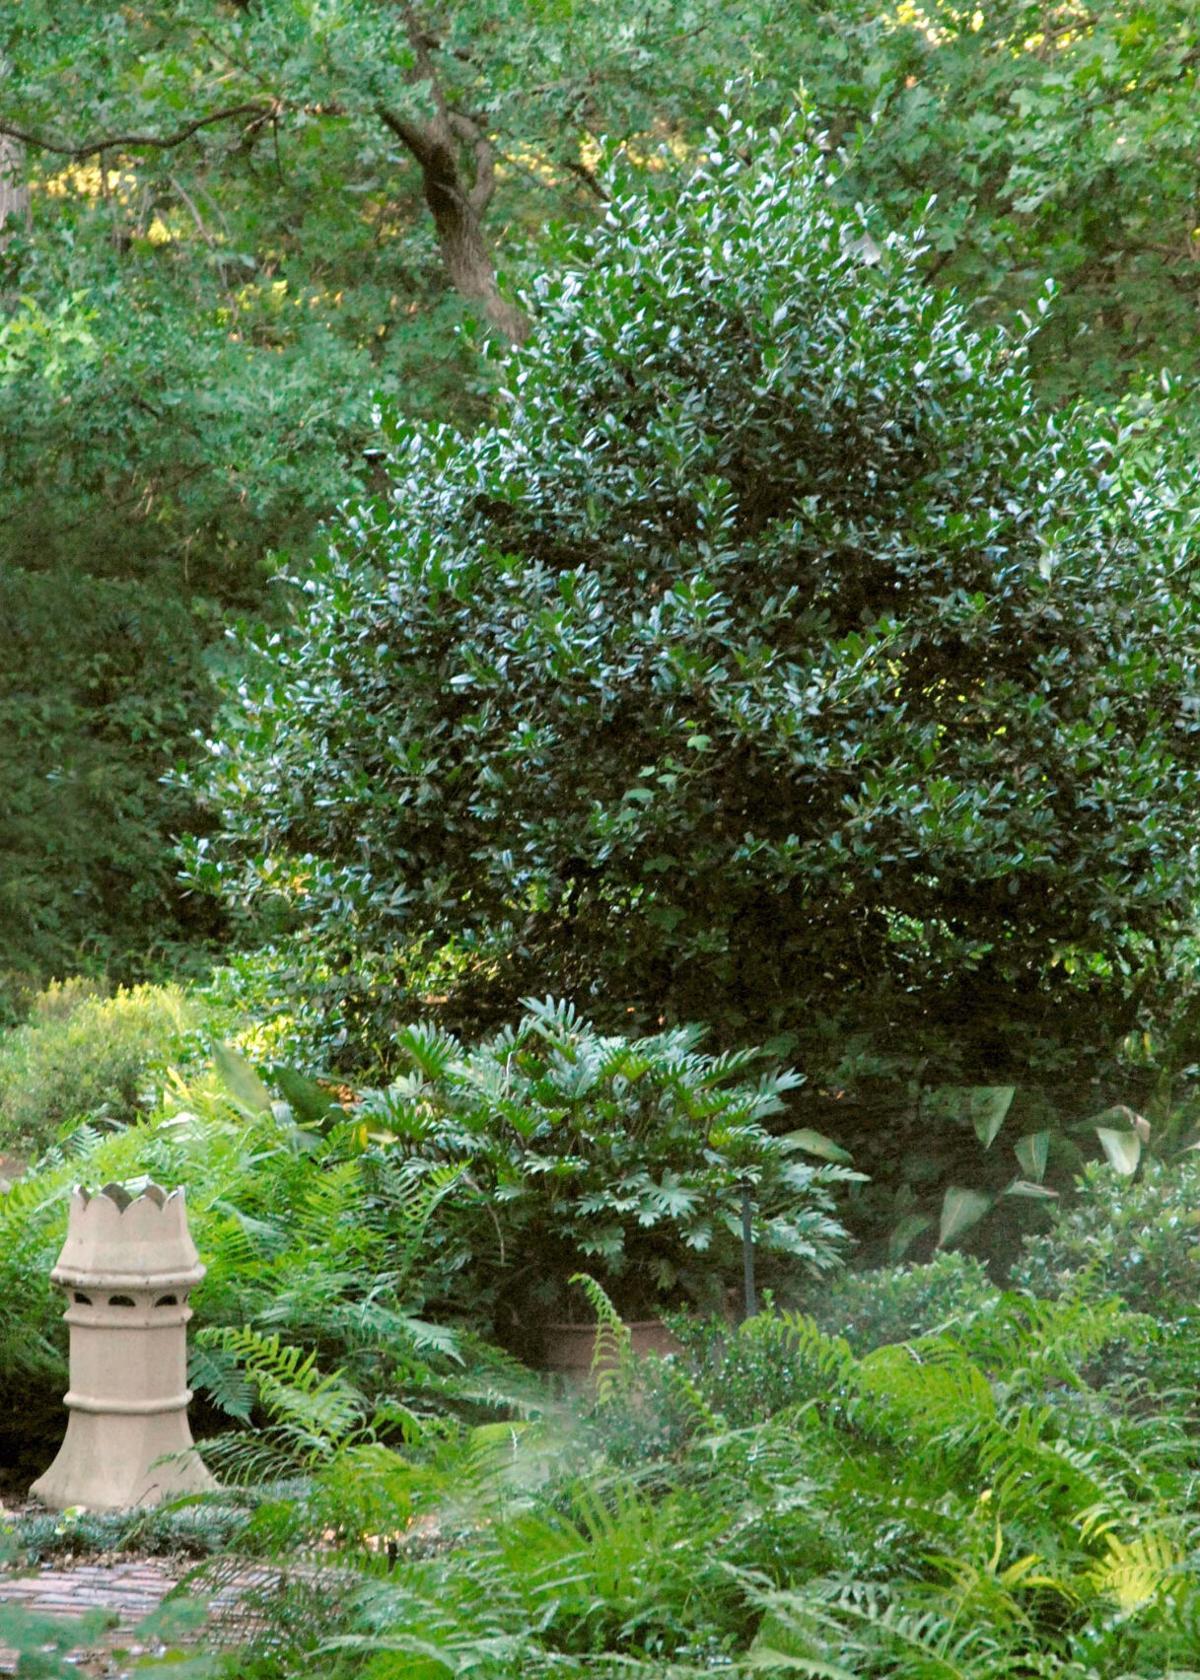 1.04.21 Nellie R. Stevens holly in author's home landscape.jpg